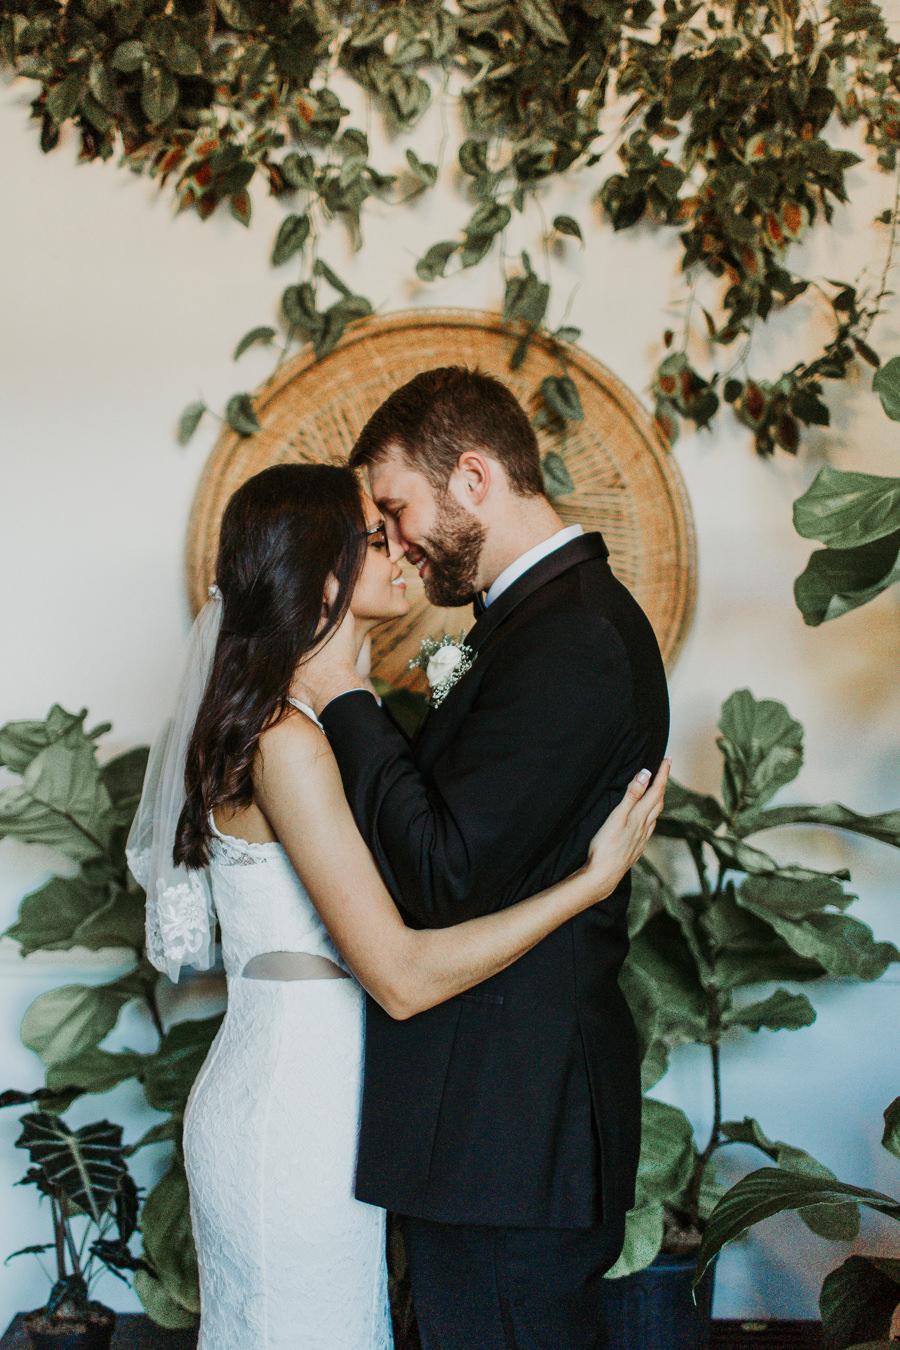 Tampa Heights Industrial Wedding at Cavu Emmy RJ-176.jpg